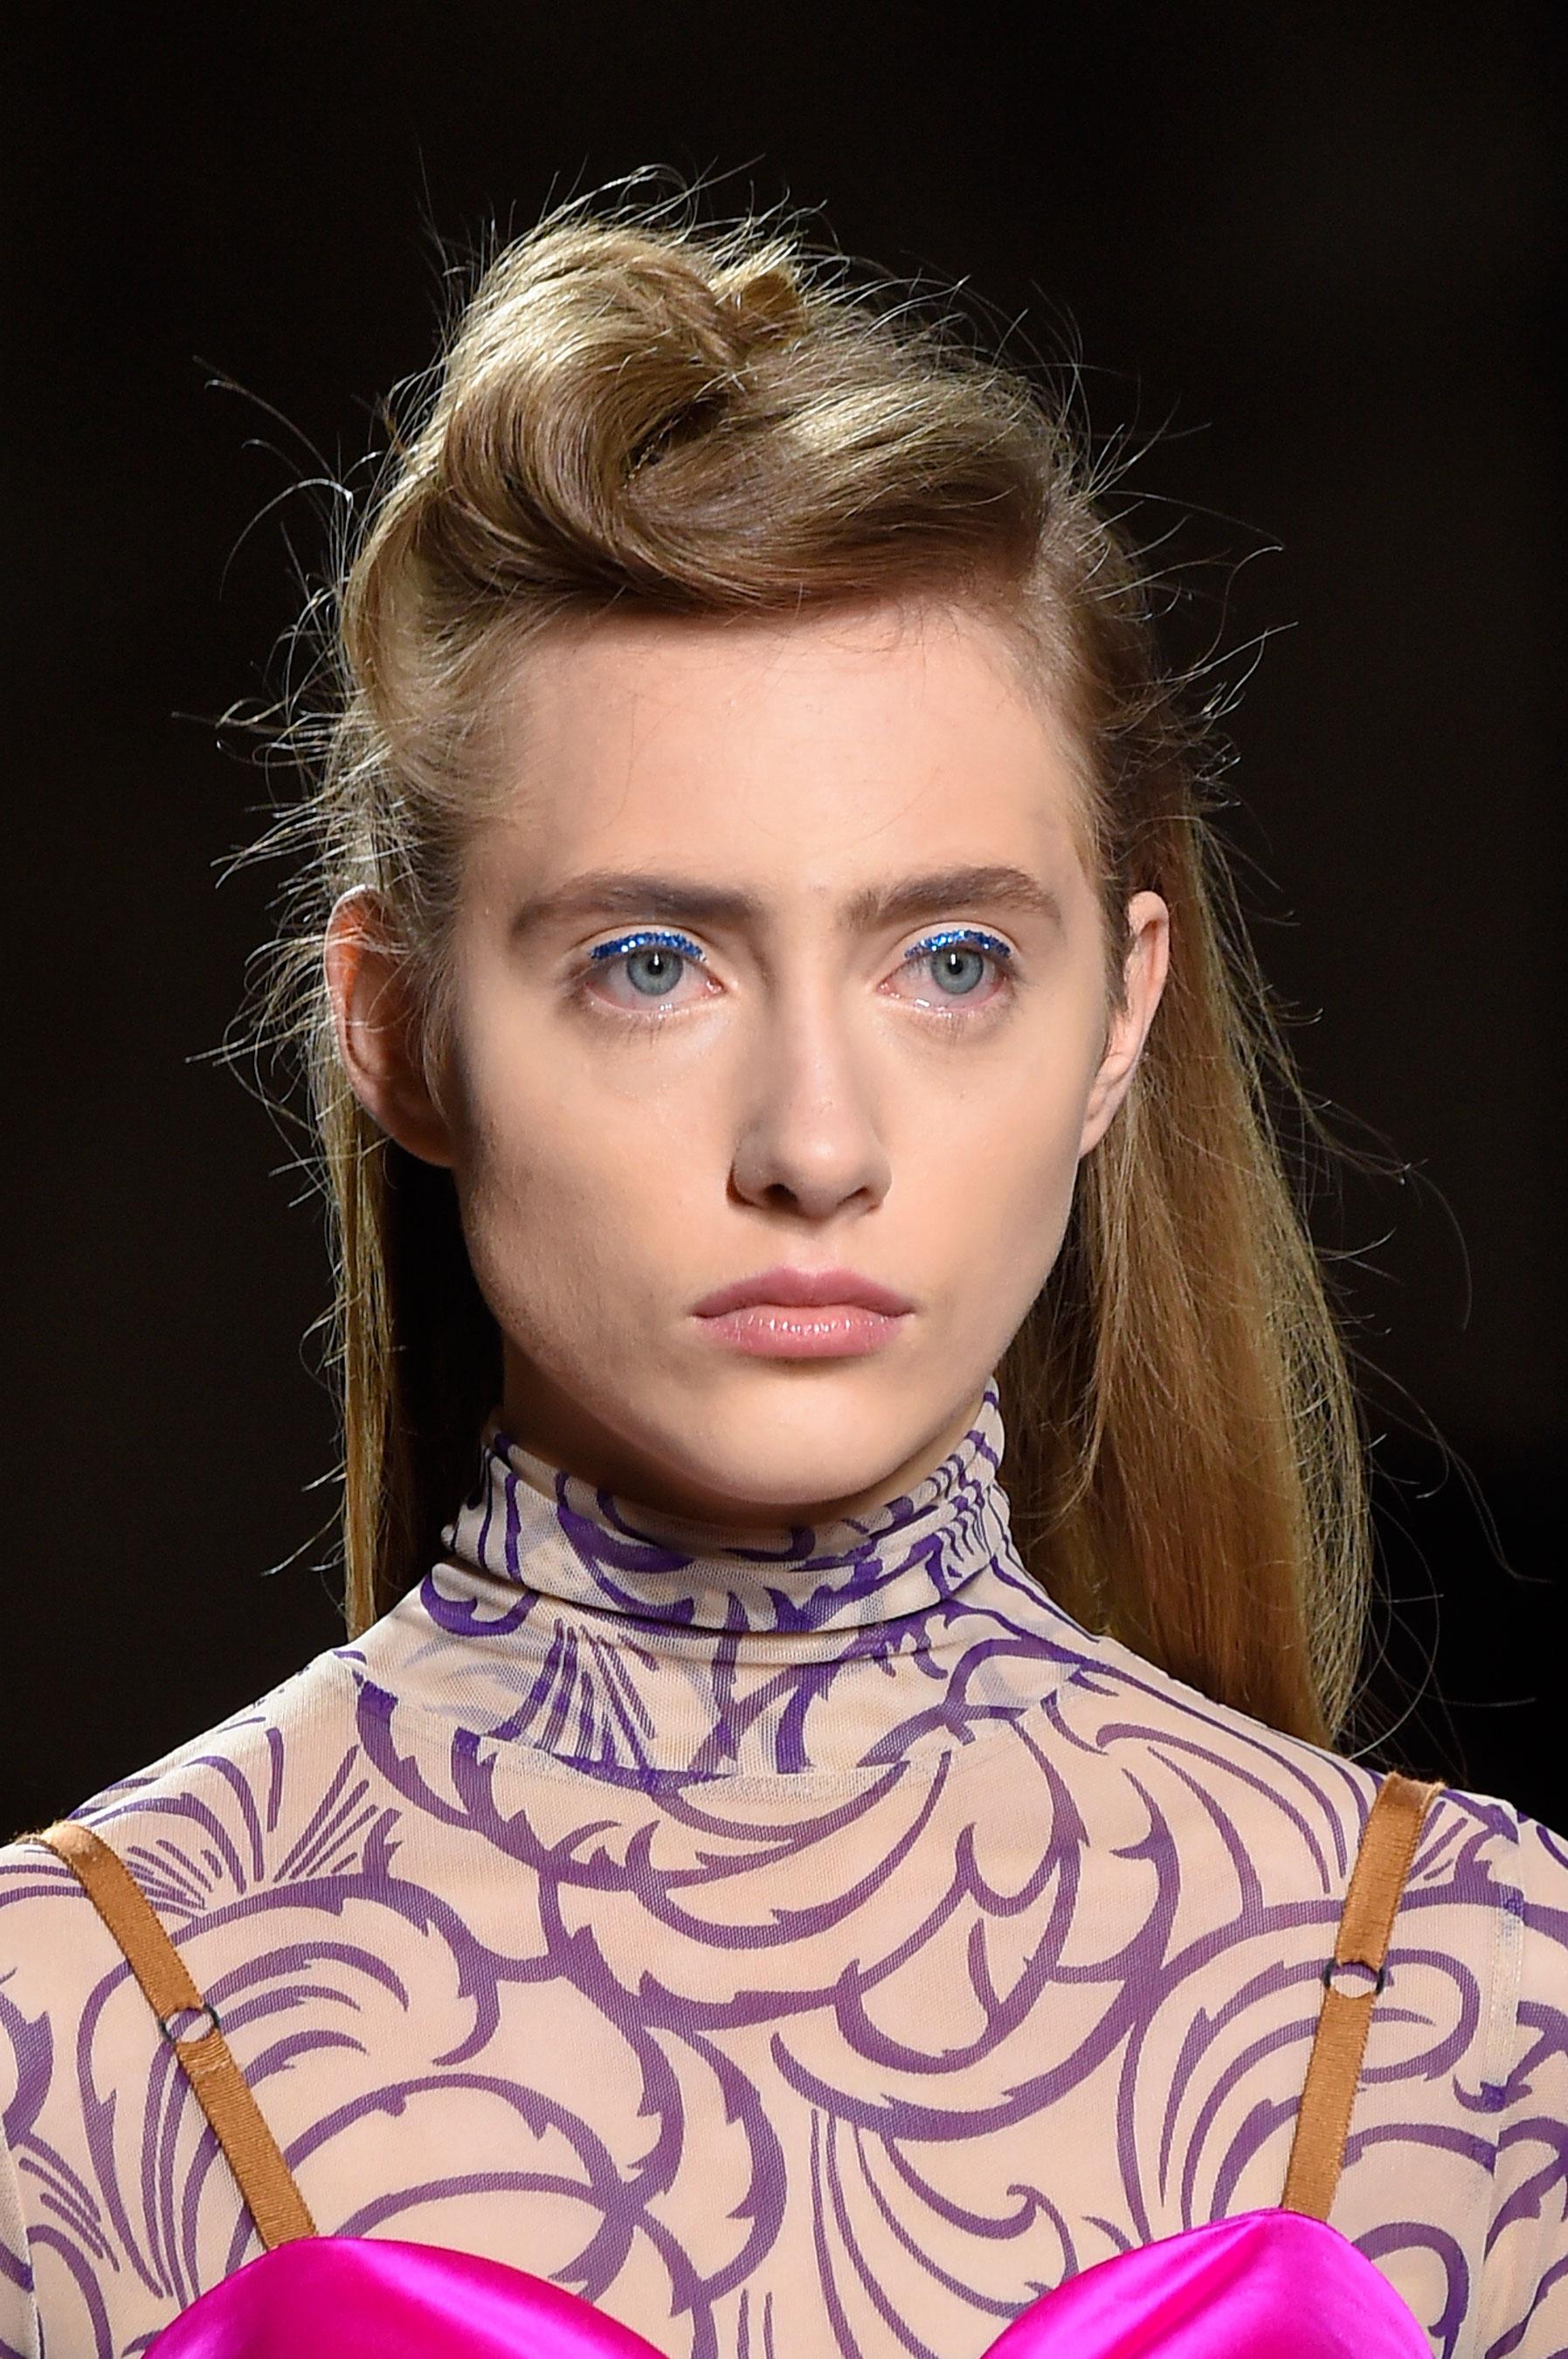 Dries-van-Noten-spring-2016-runway-beauty-fashion-show-the-impression-03